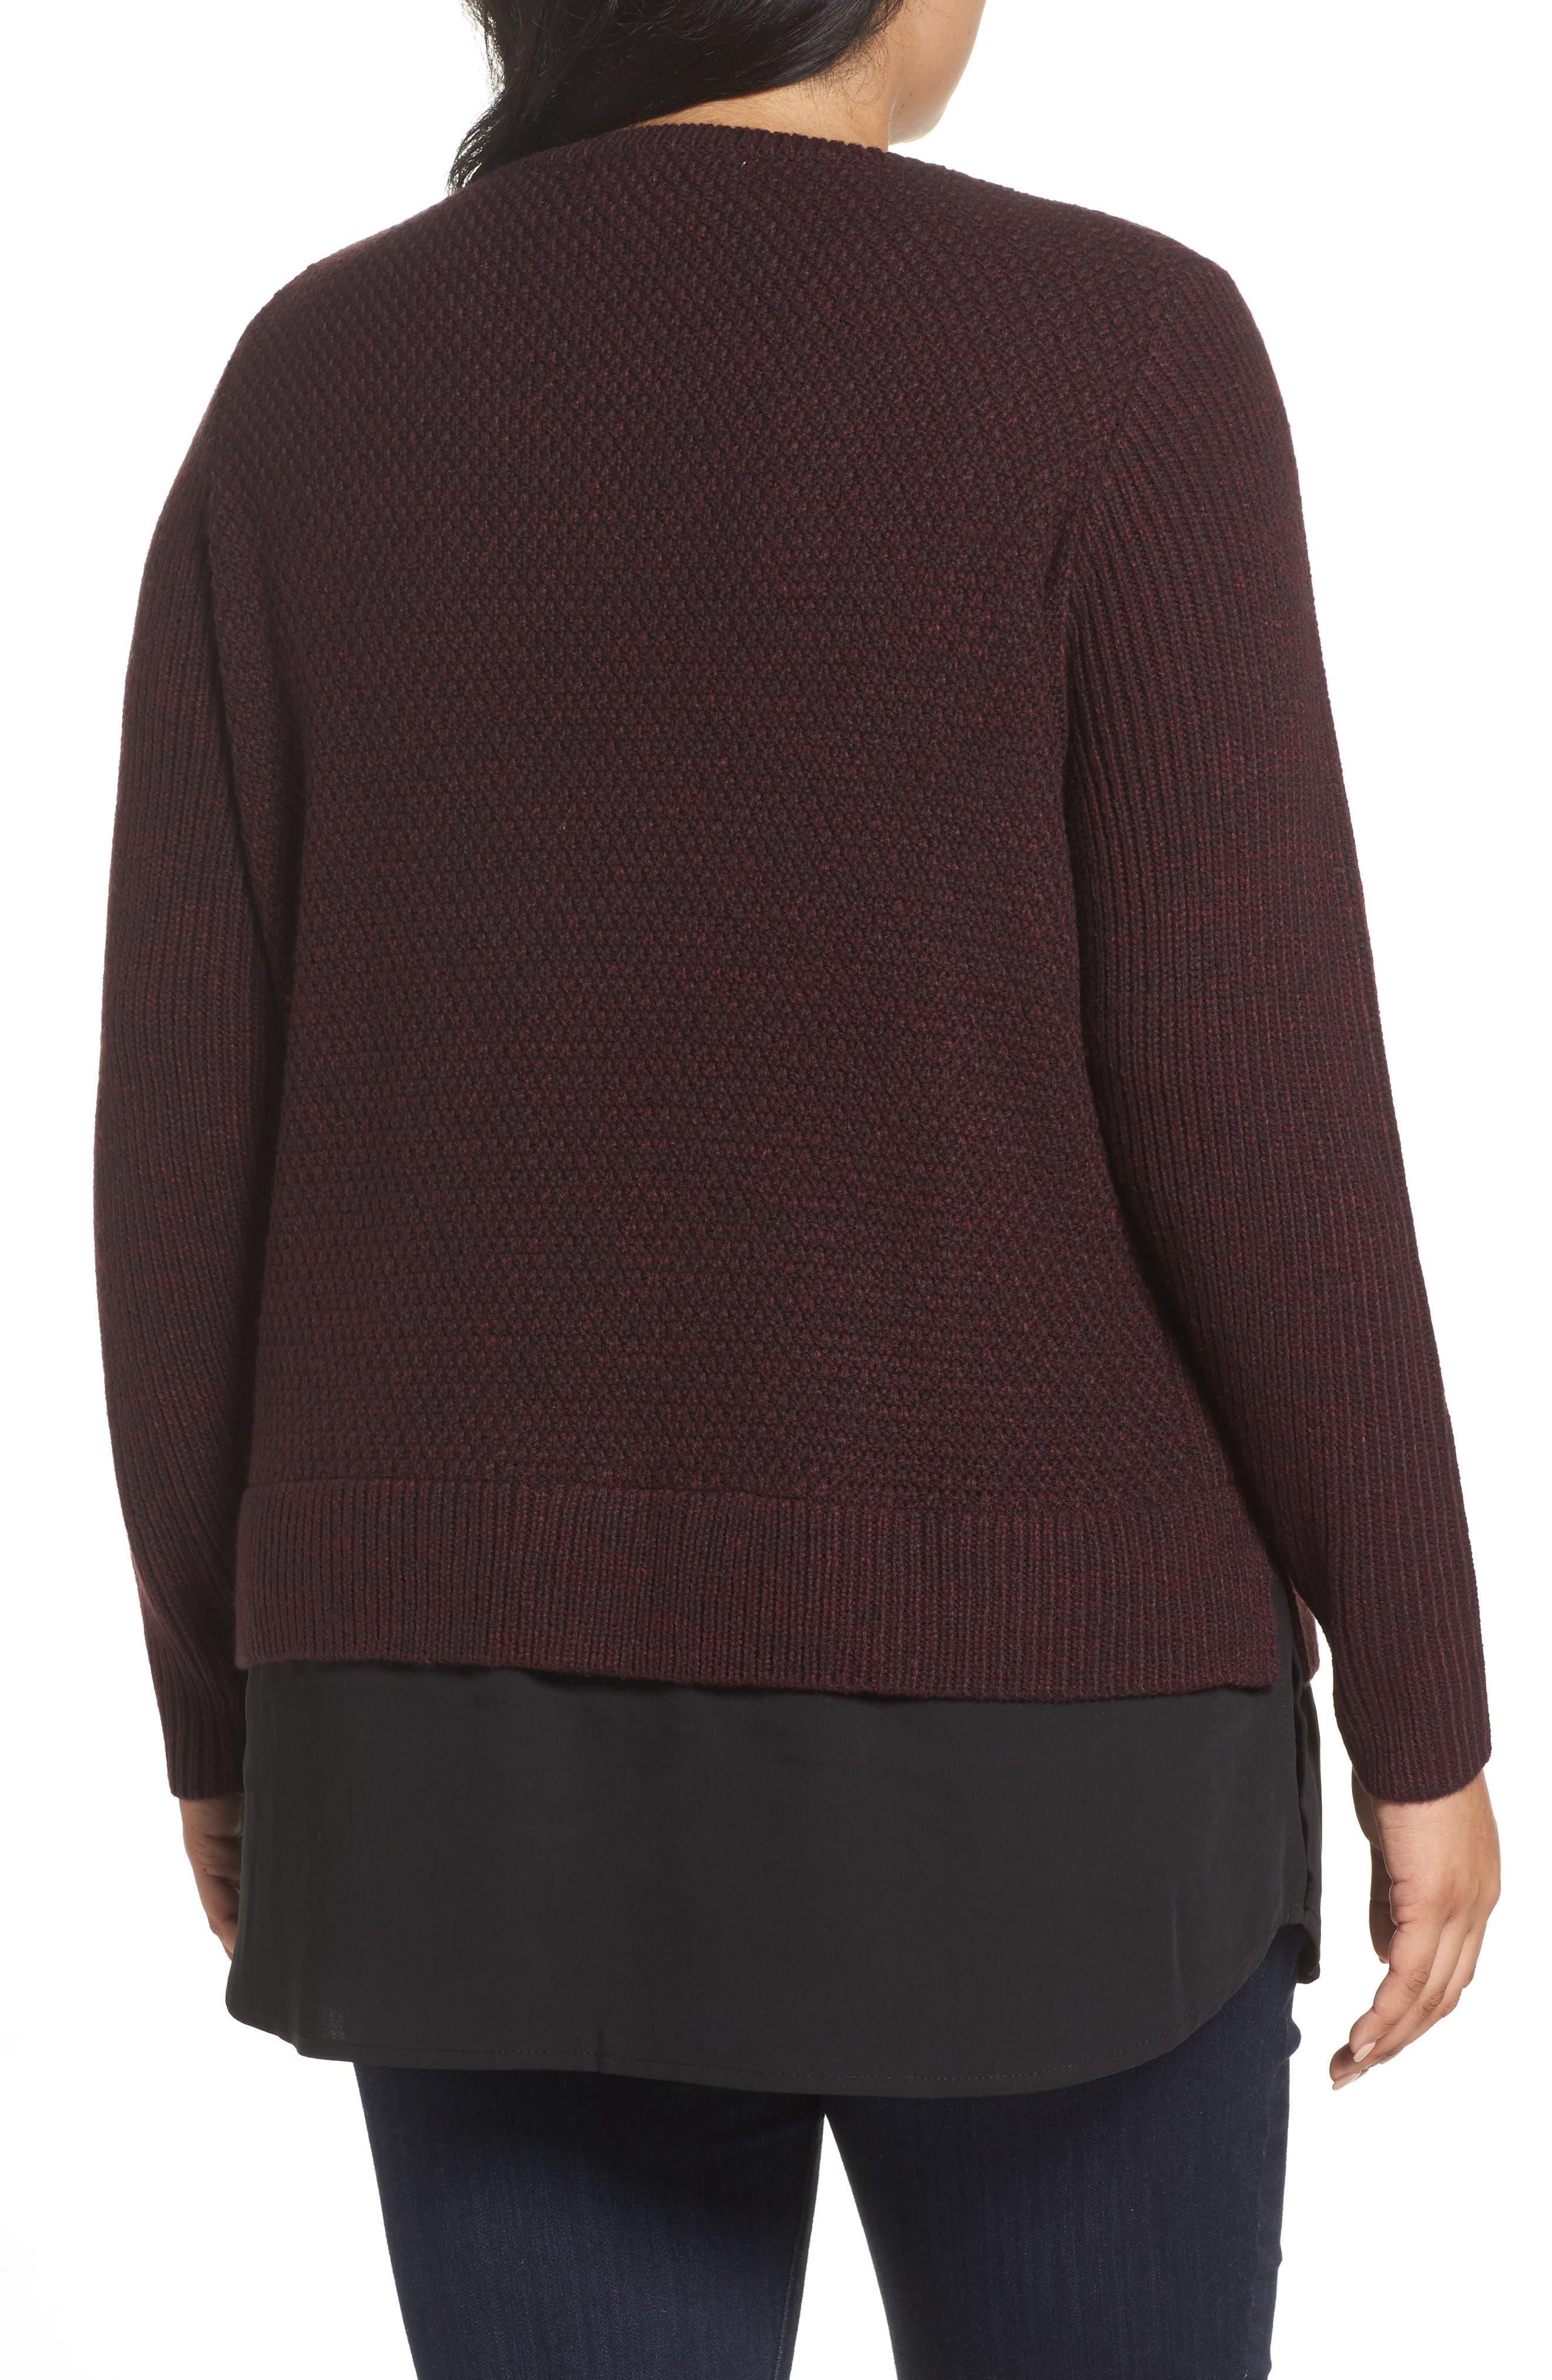 Alternate Image 2  - Foxcroft Sophia Layered Look Sweater (Plus Size)